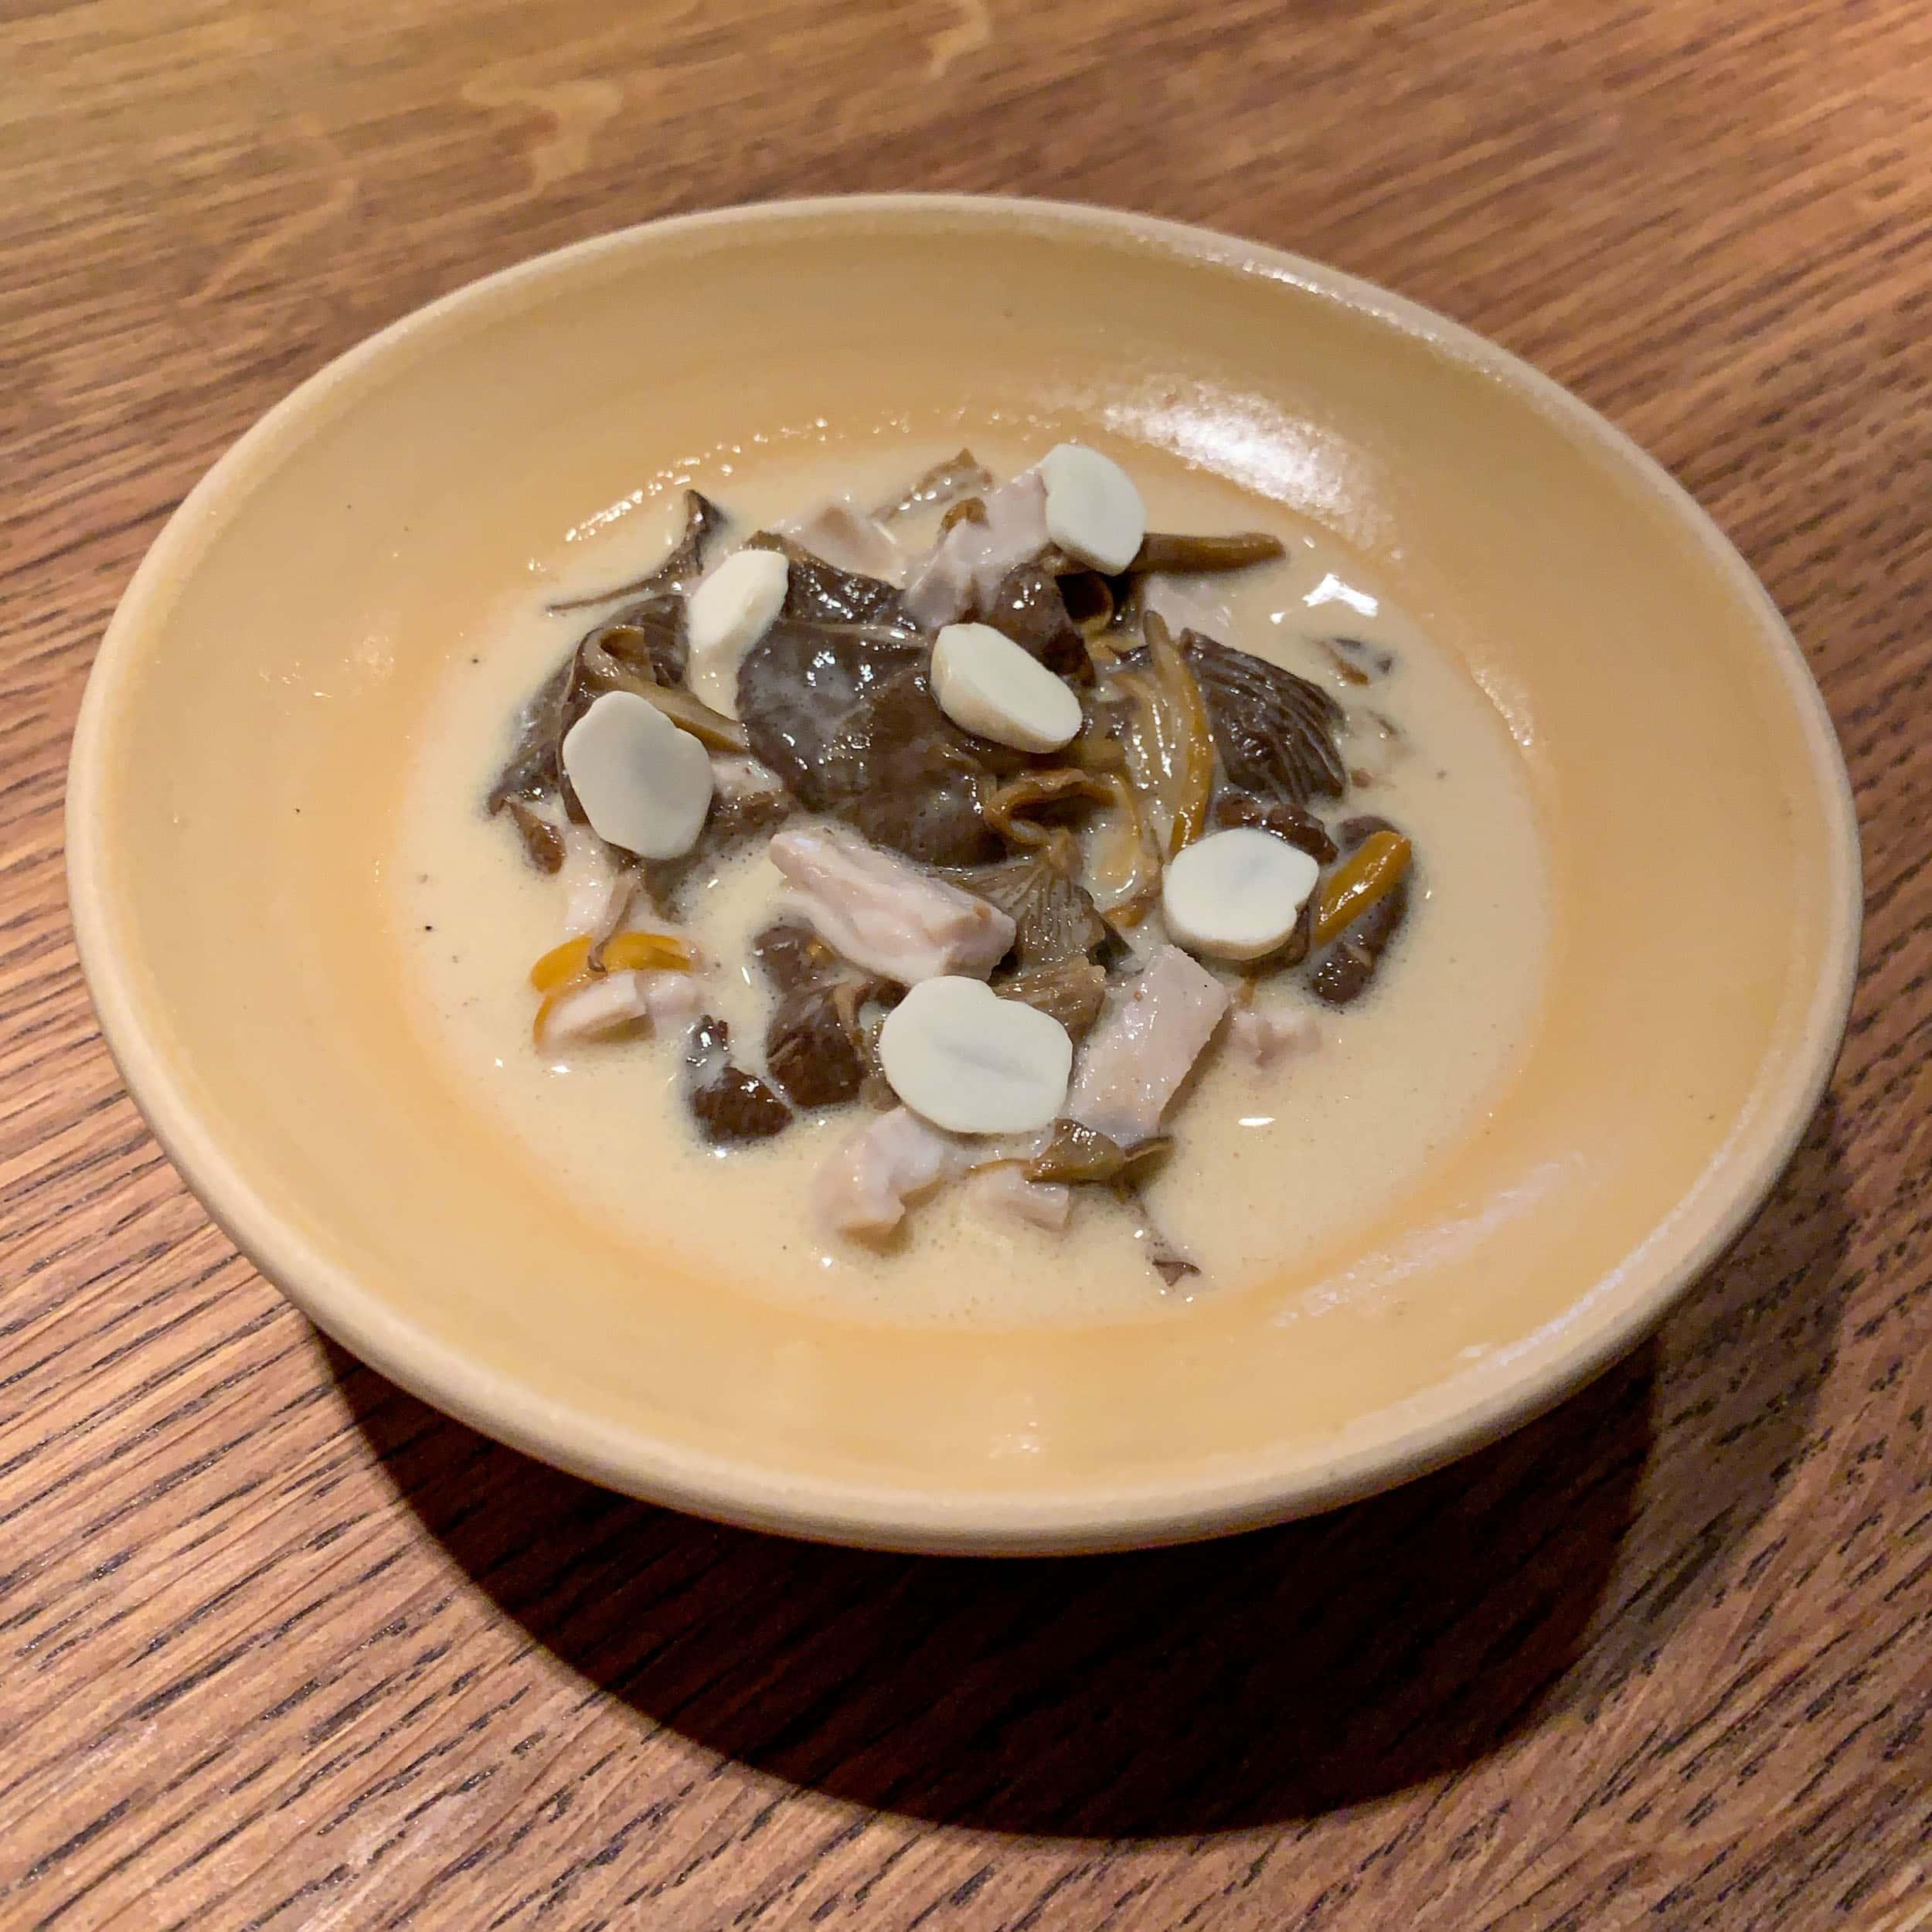 Mushroom and rabbit soup